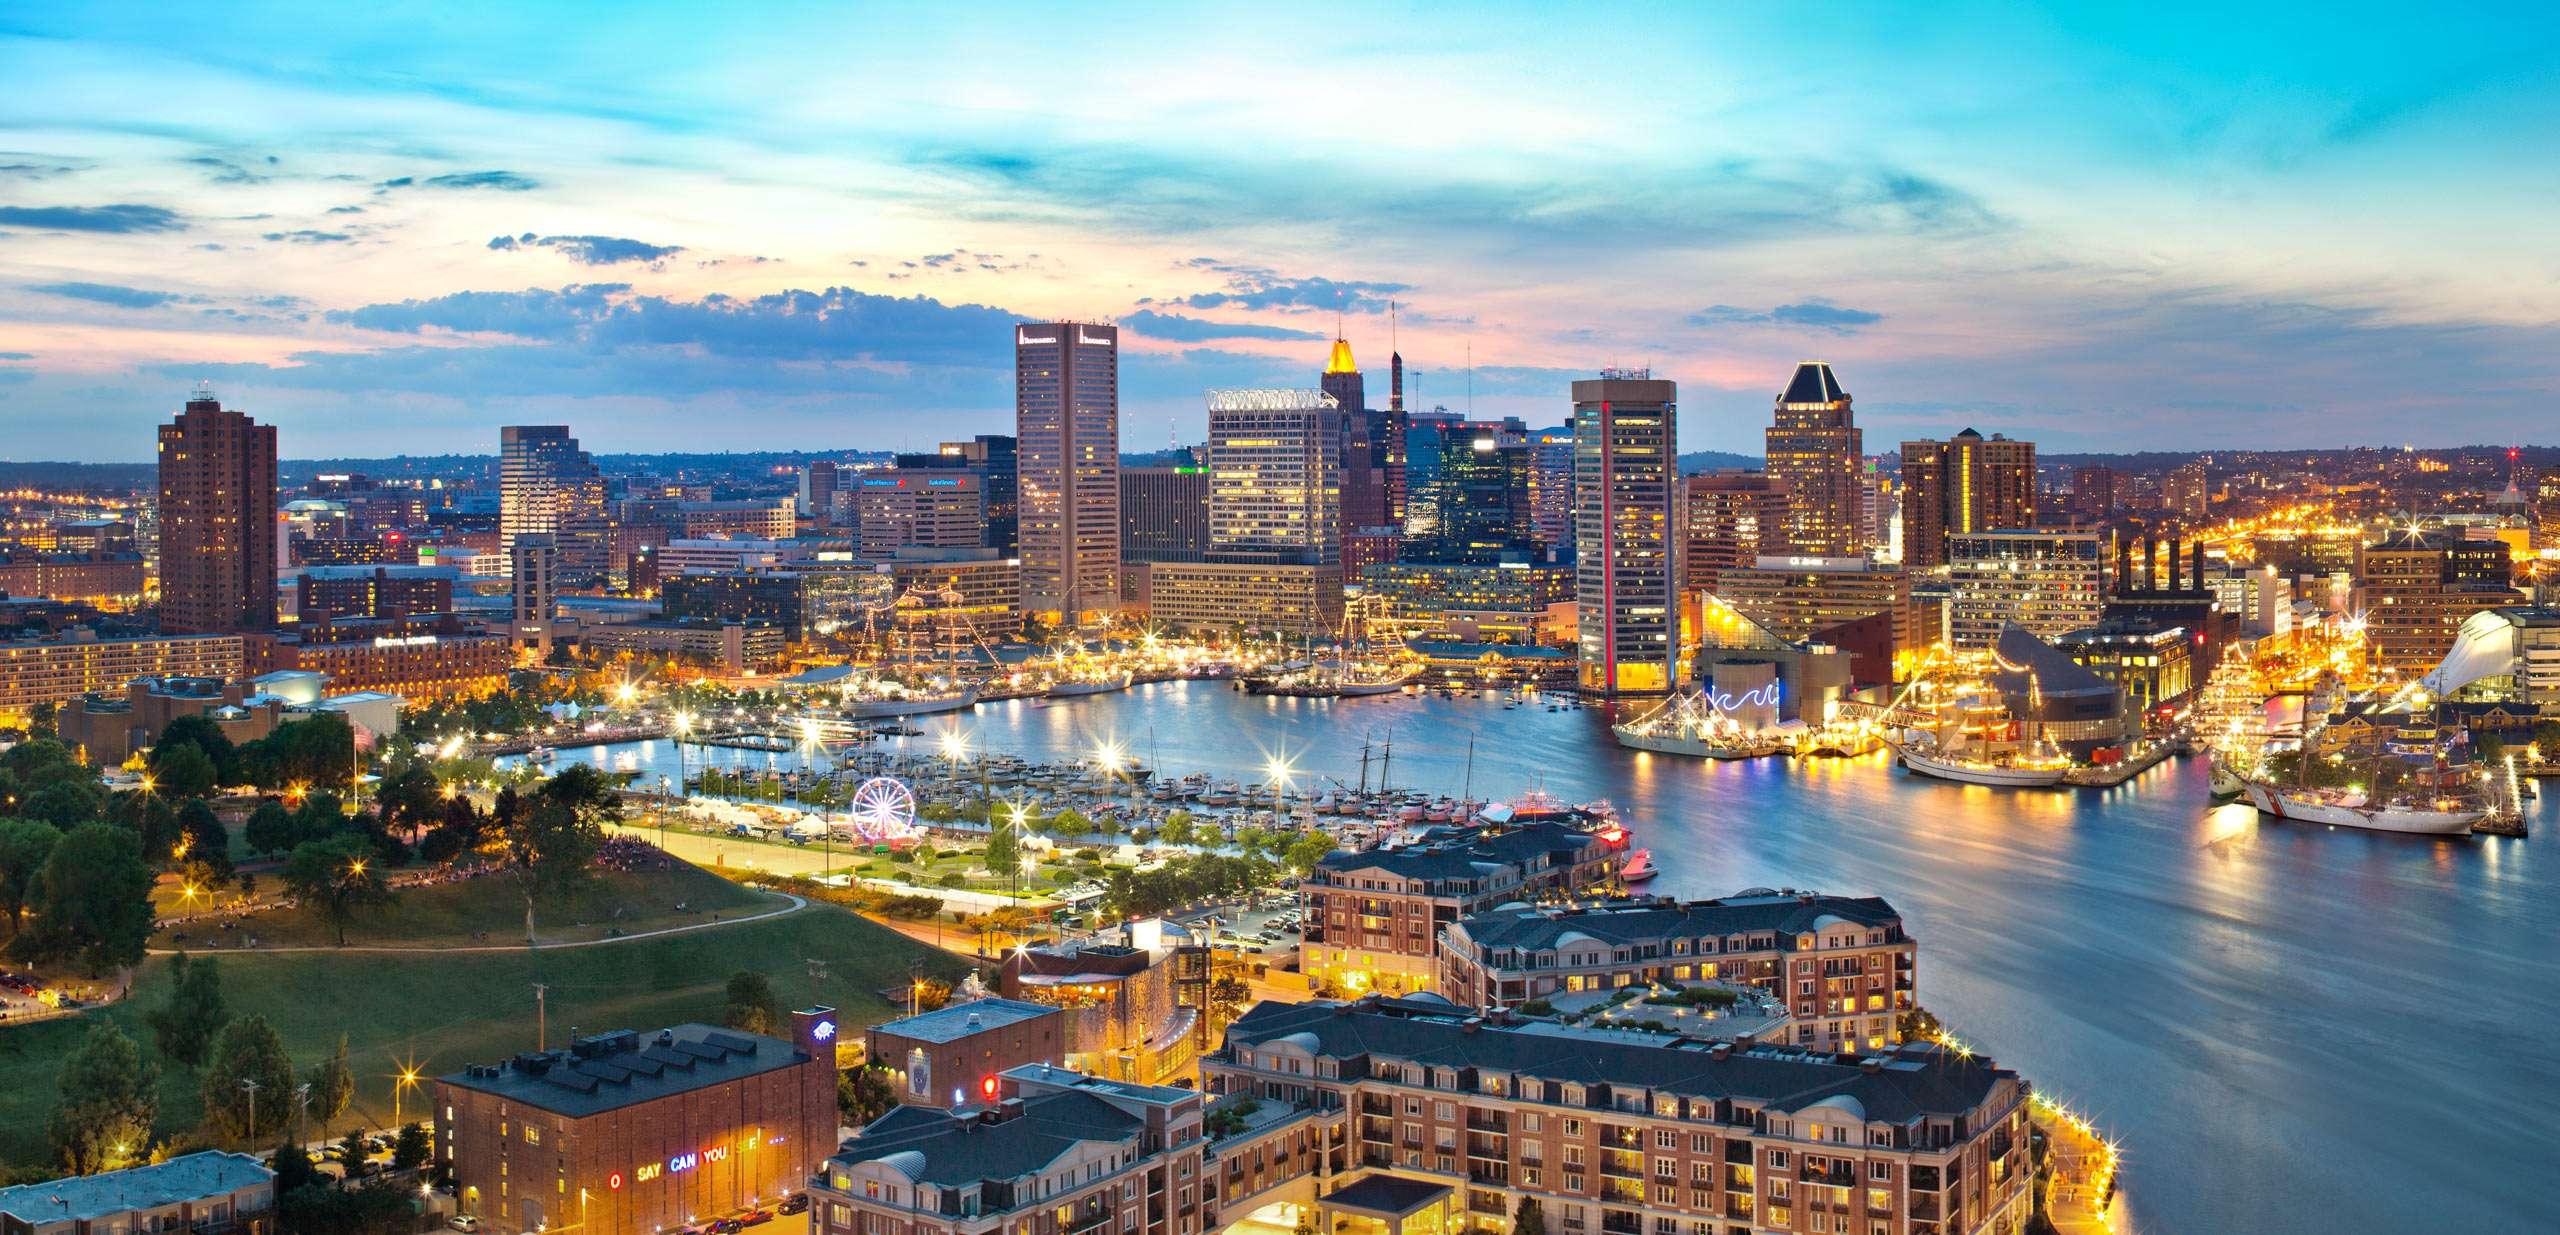 PORTFOLIO - Baltimore -Attractions  #18  PCG676